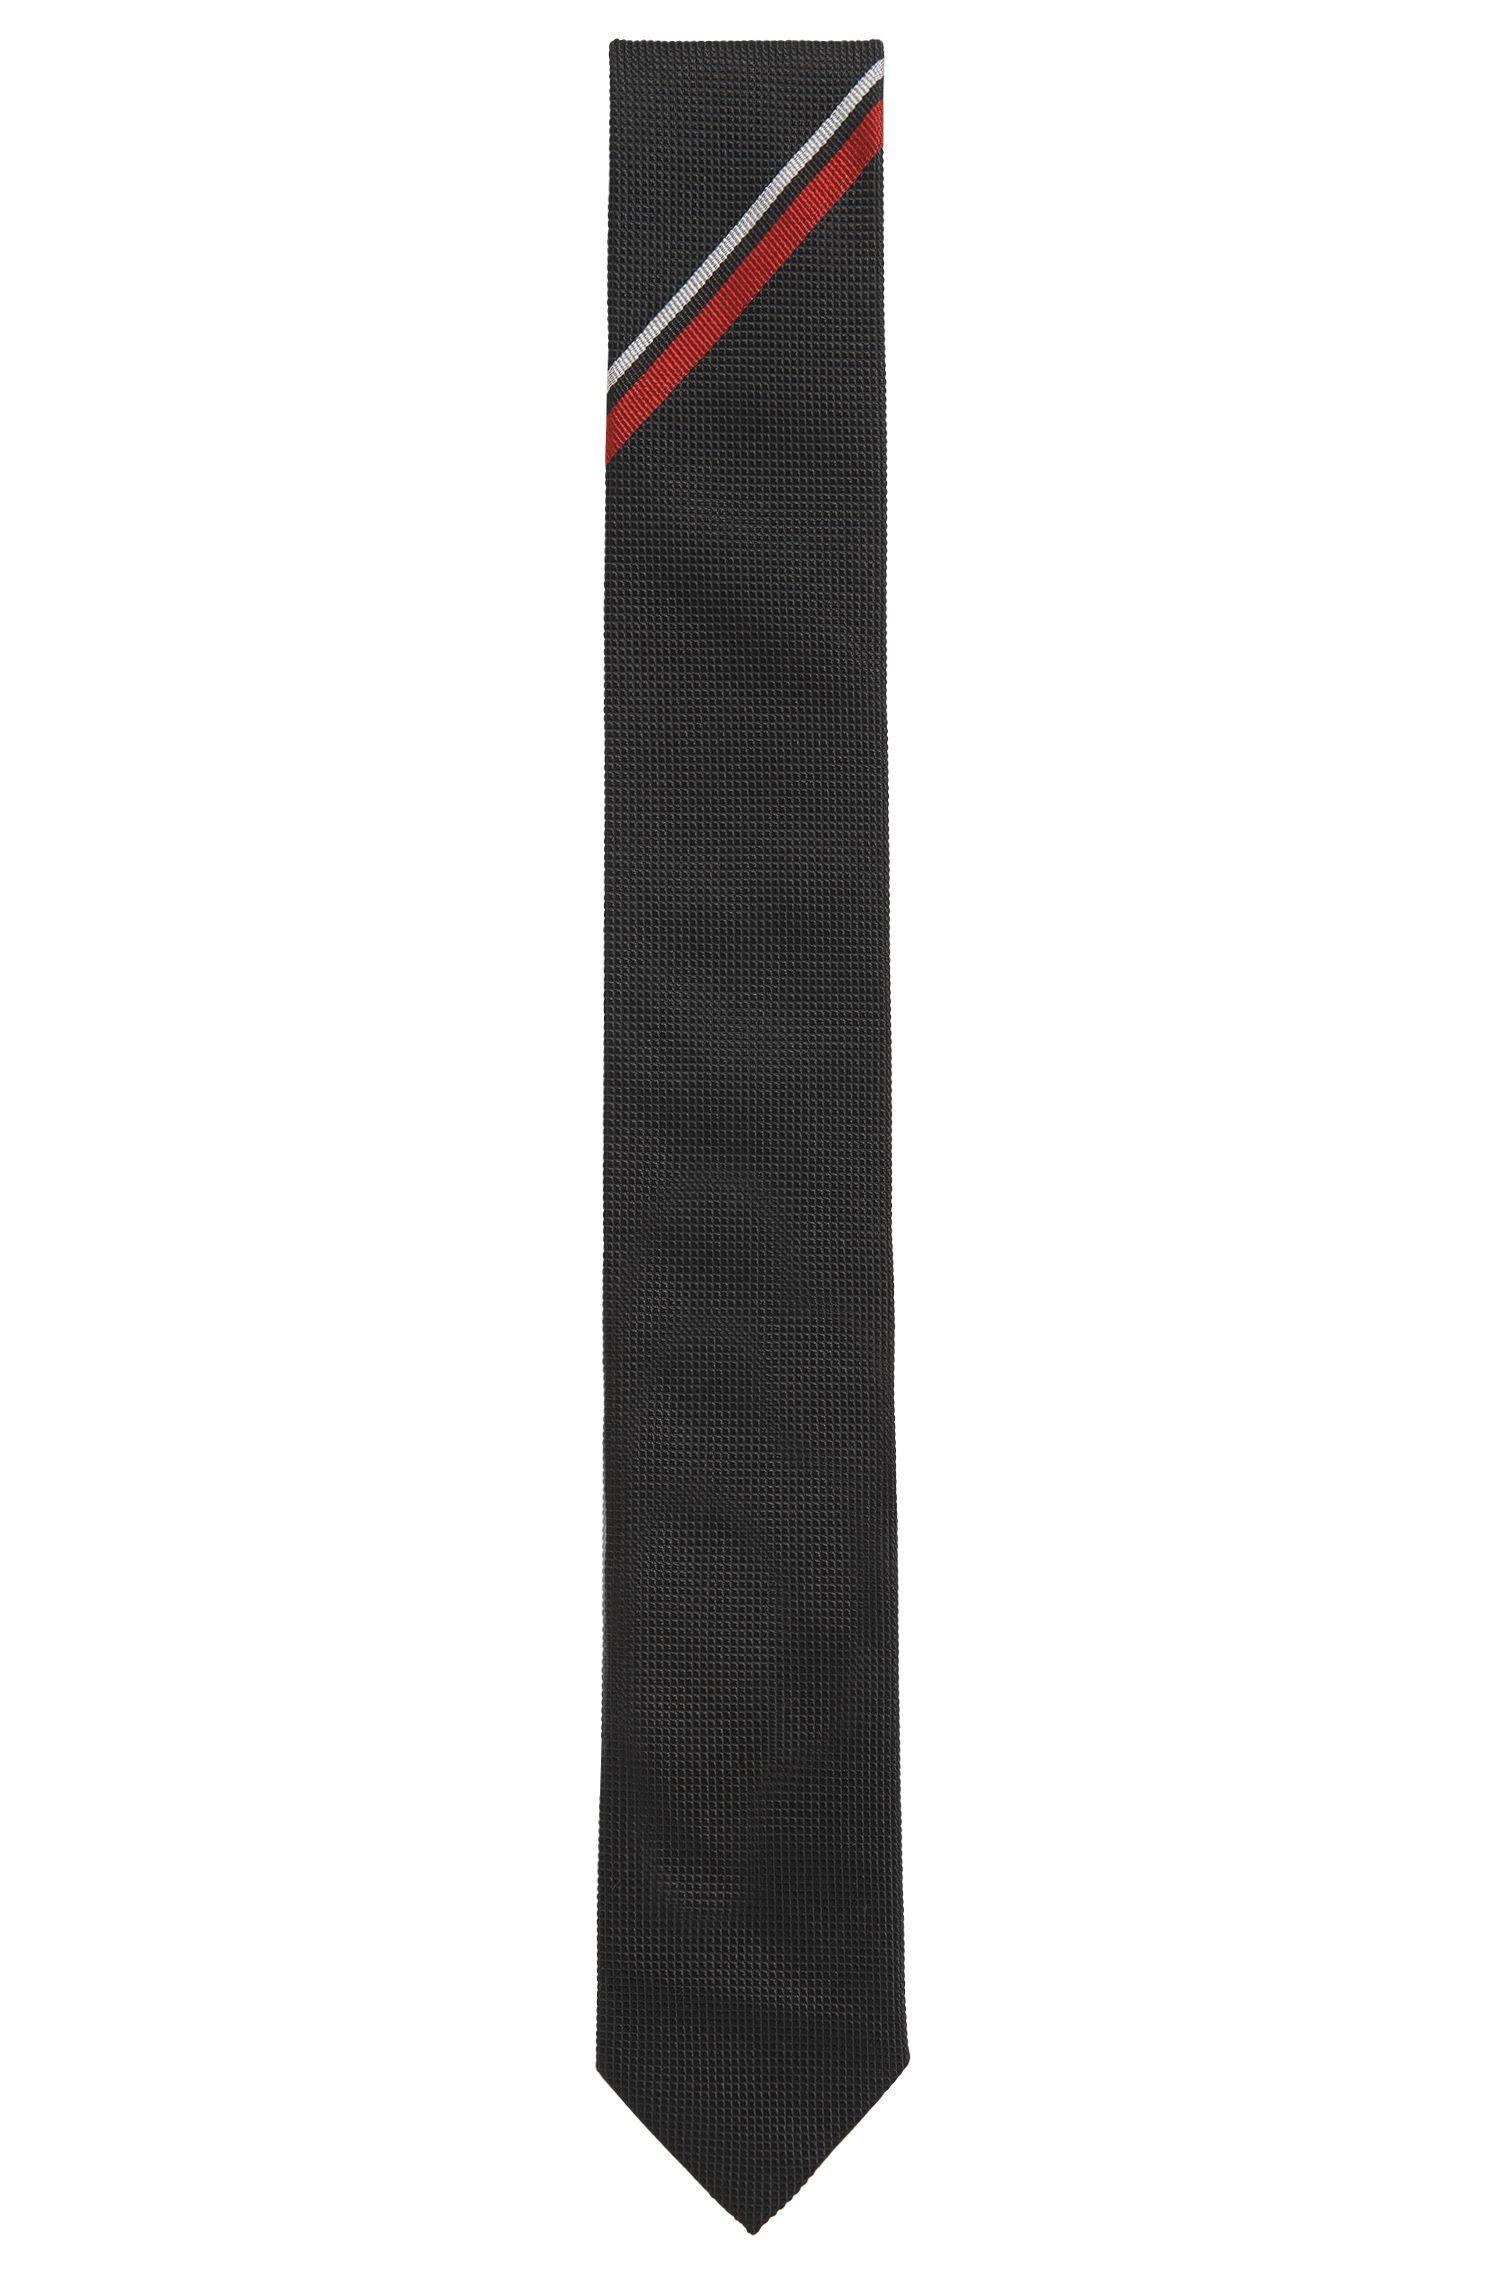 'Tie 6 cm' | Slim, Striped Silk Tie